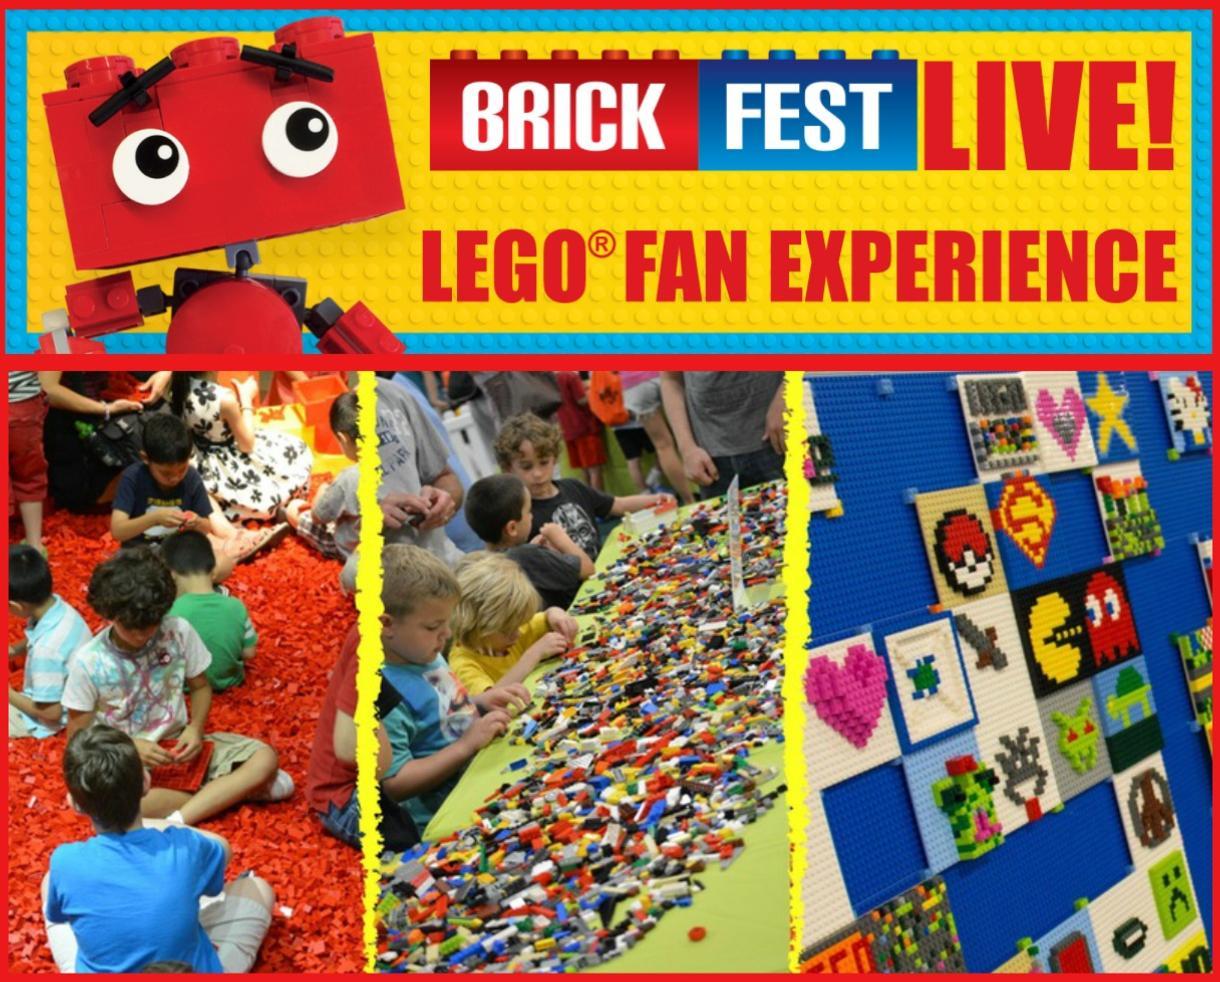 $18.50+ for Brick Fest Live LEGO Fan Experience Ticket - Feb. 25th & 26th at Cobb Galleria Centre - Atlanta (25% Off)